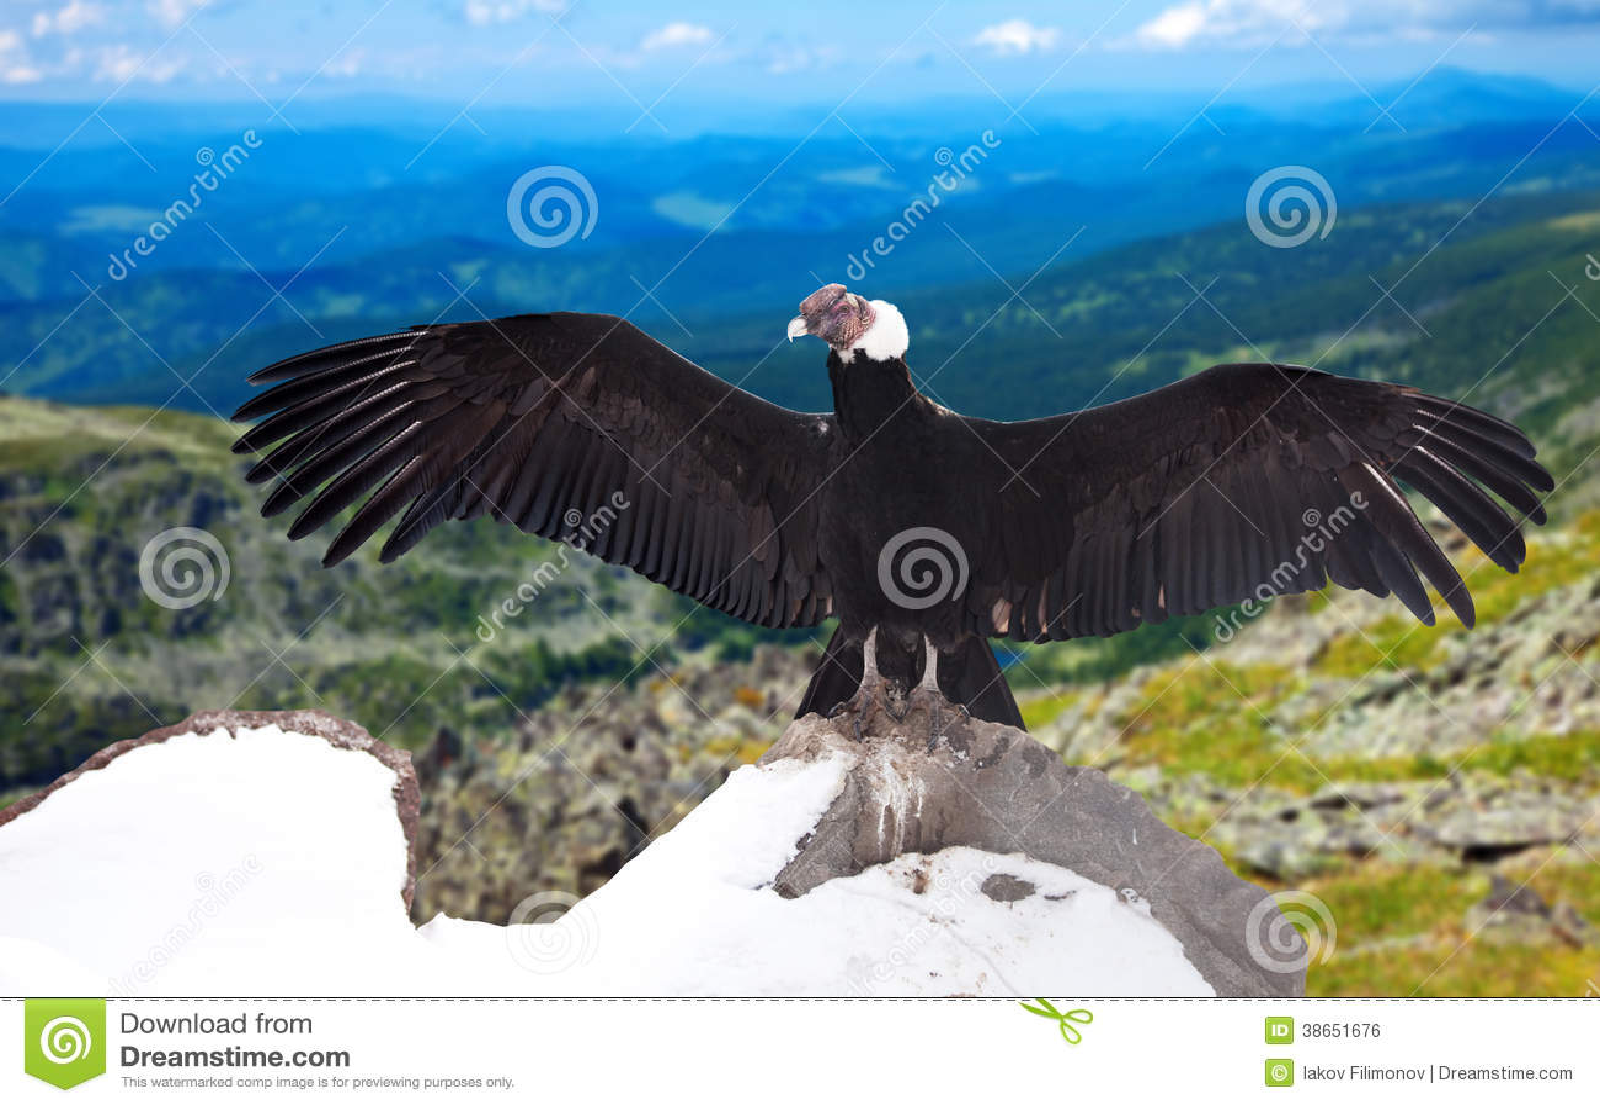 Andean condor in wildness area